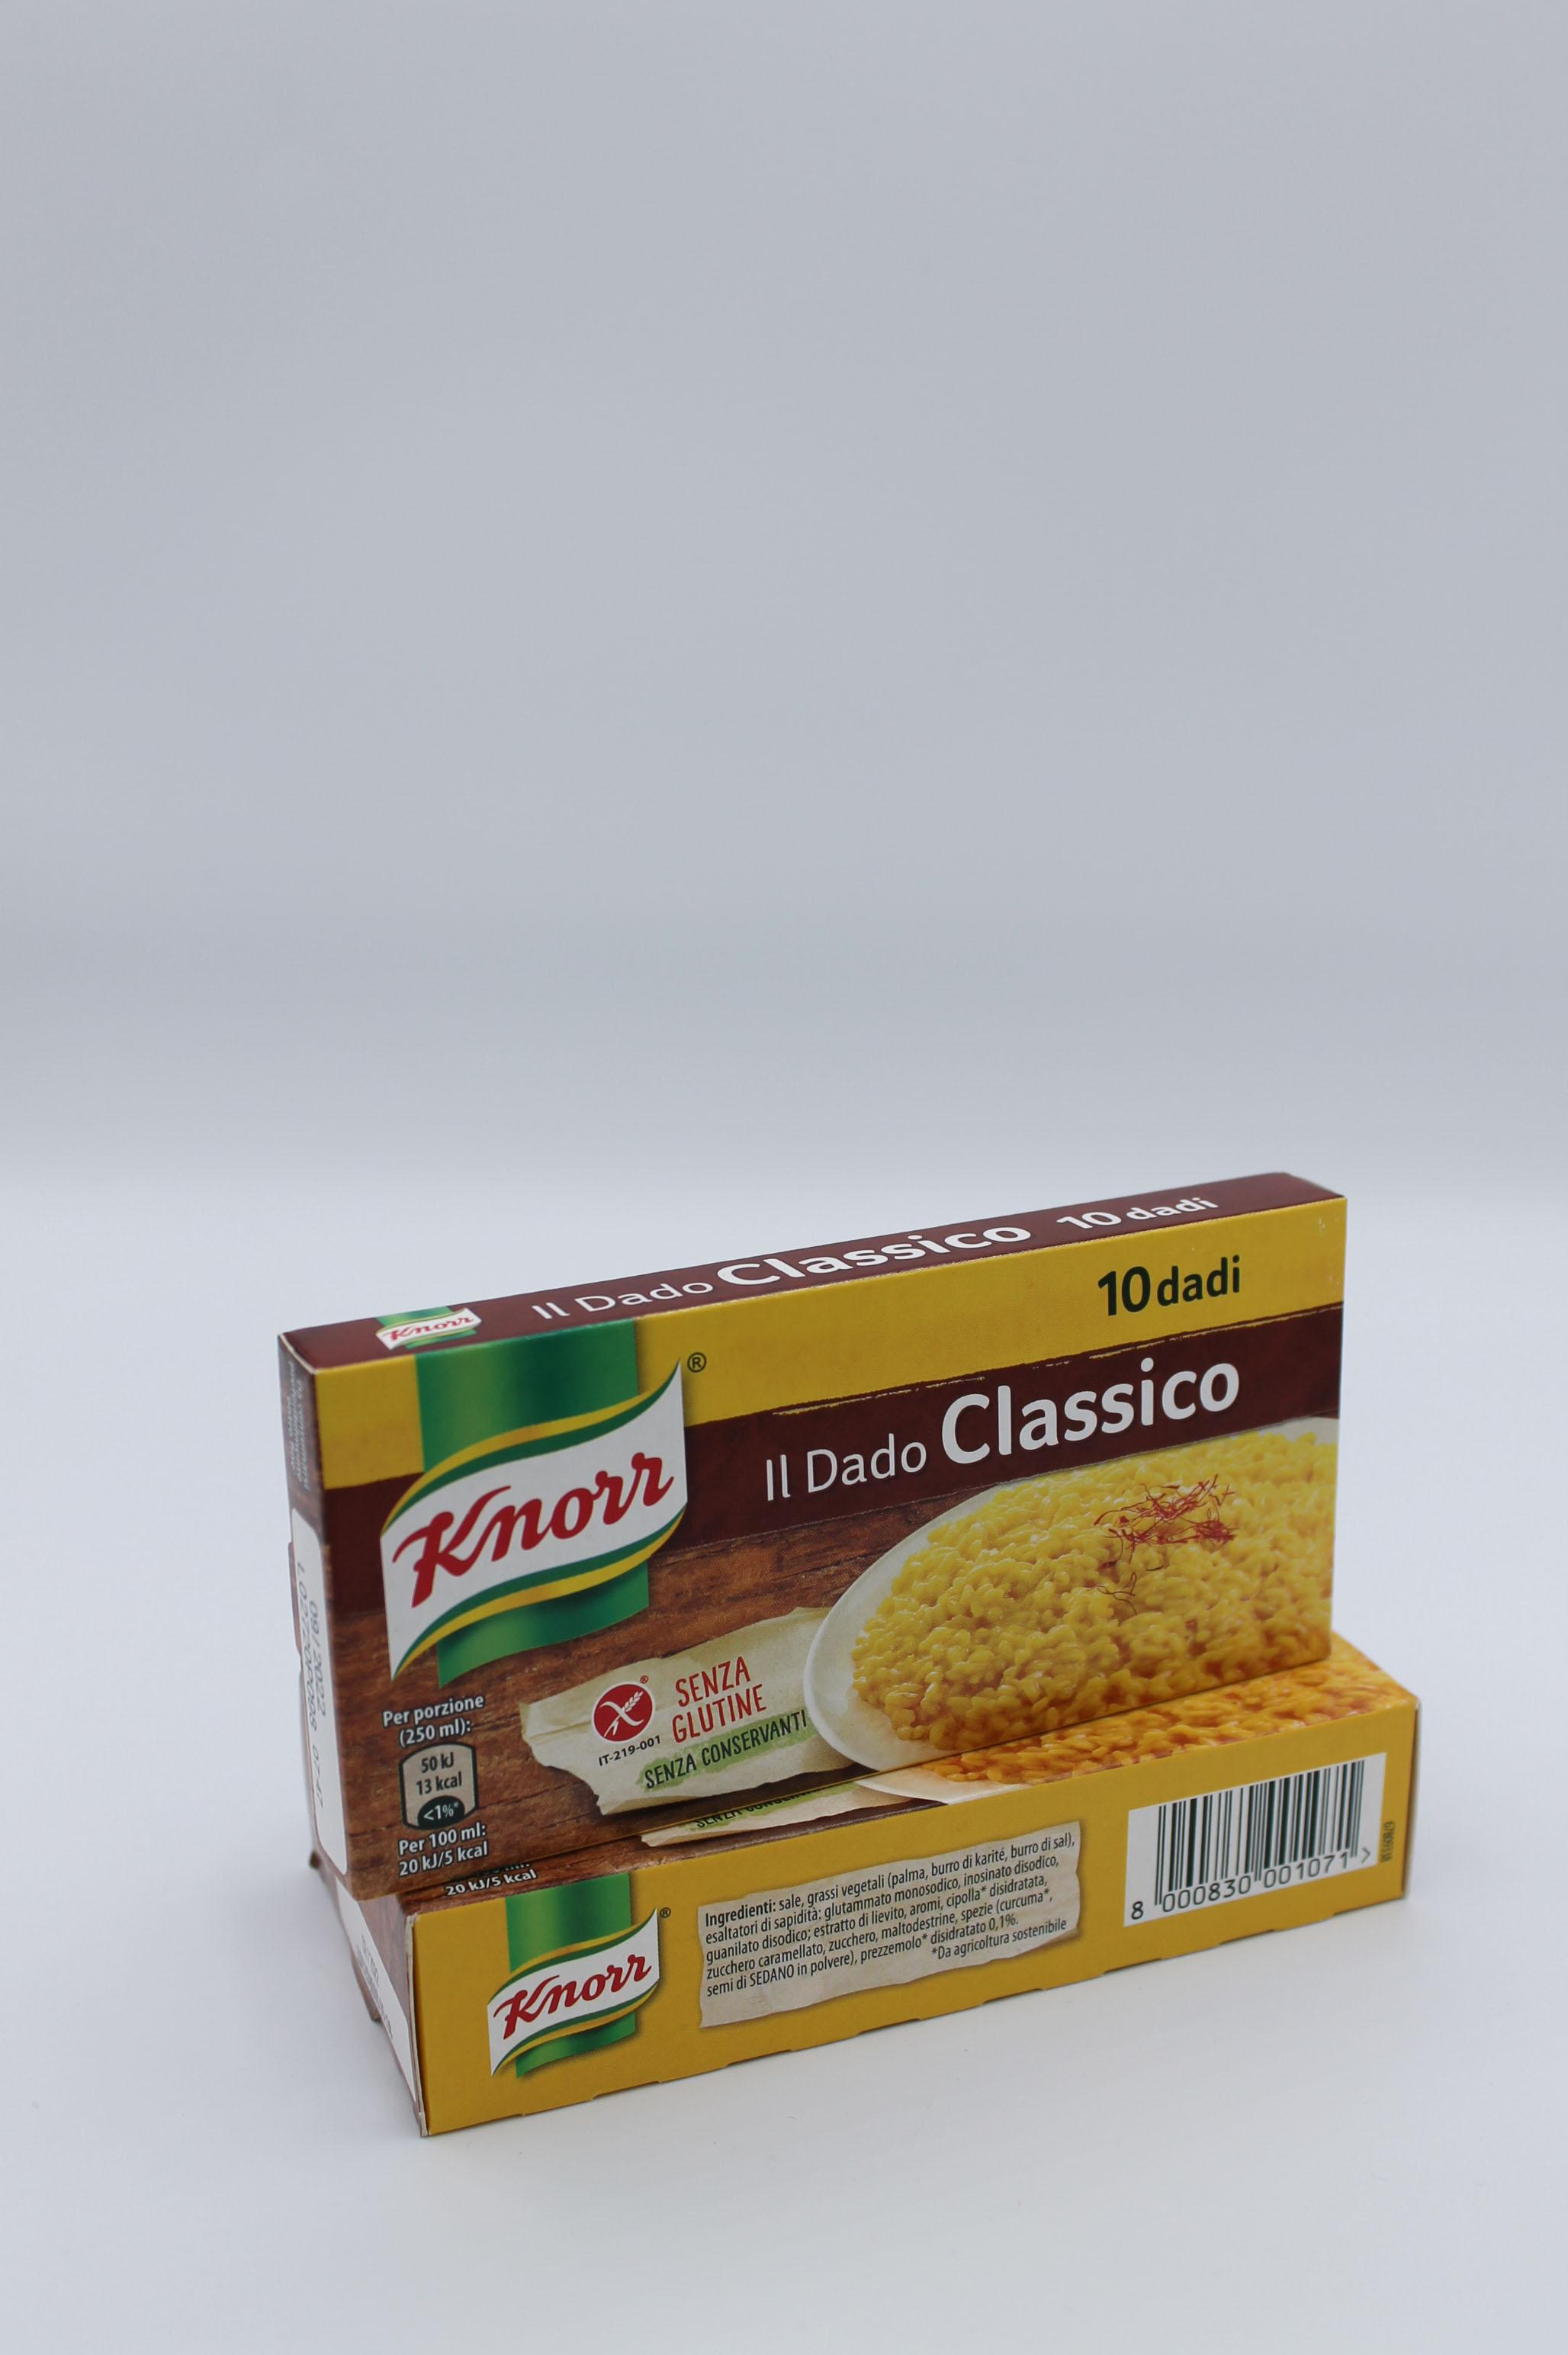 Knorr dado classico 100 gr.